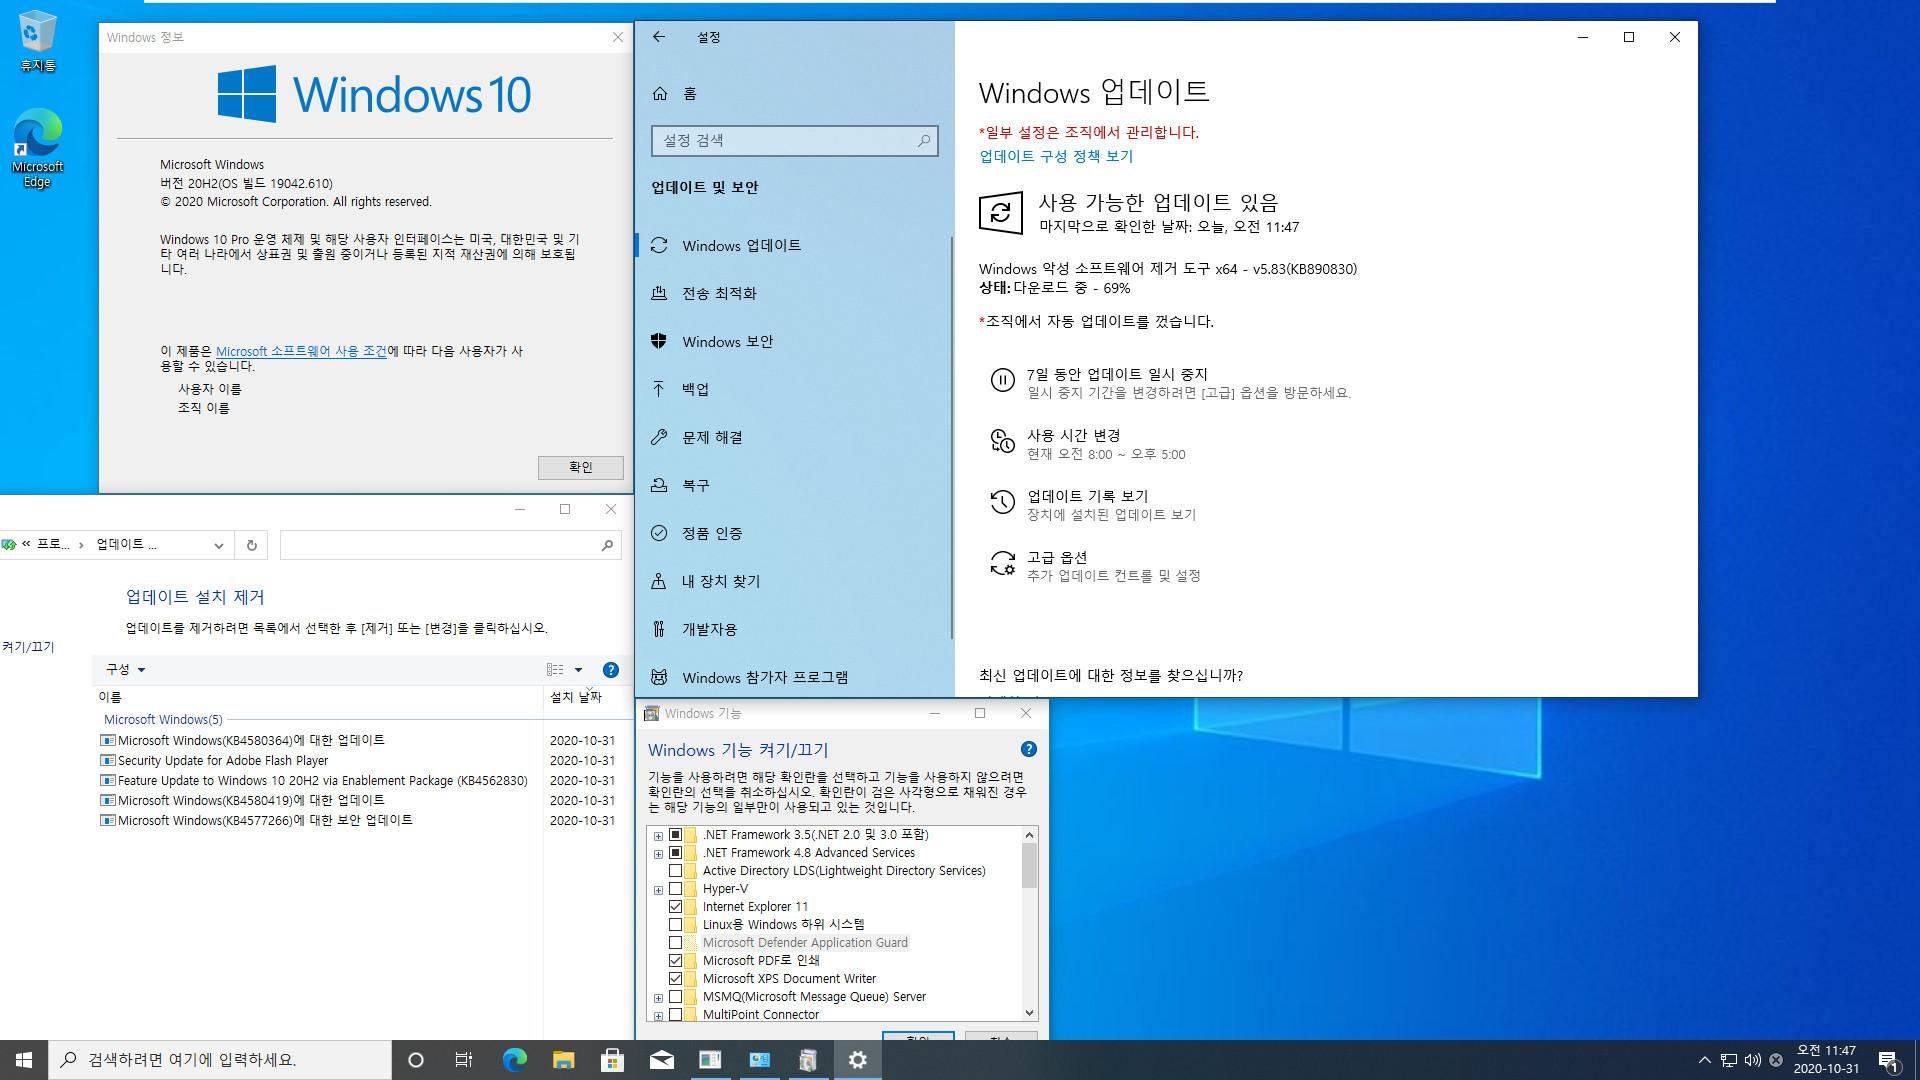 Windows 10 업데이트 설치하기.bat 으로 일괄 설치하기 - 서비스 스택 업데이트만 앞에 1 붙여서 먼저 설치되게 하면 전부 설치됩니다 2020-10-31_114750.jpg